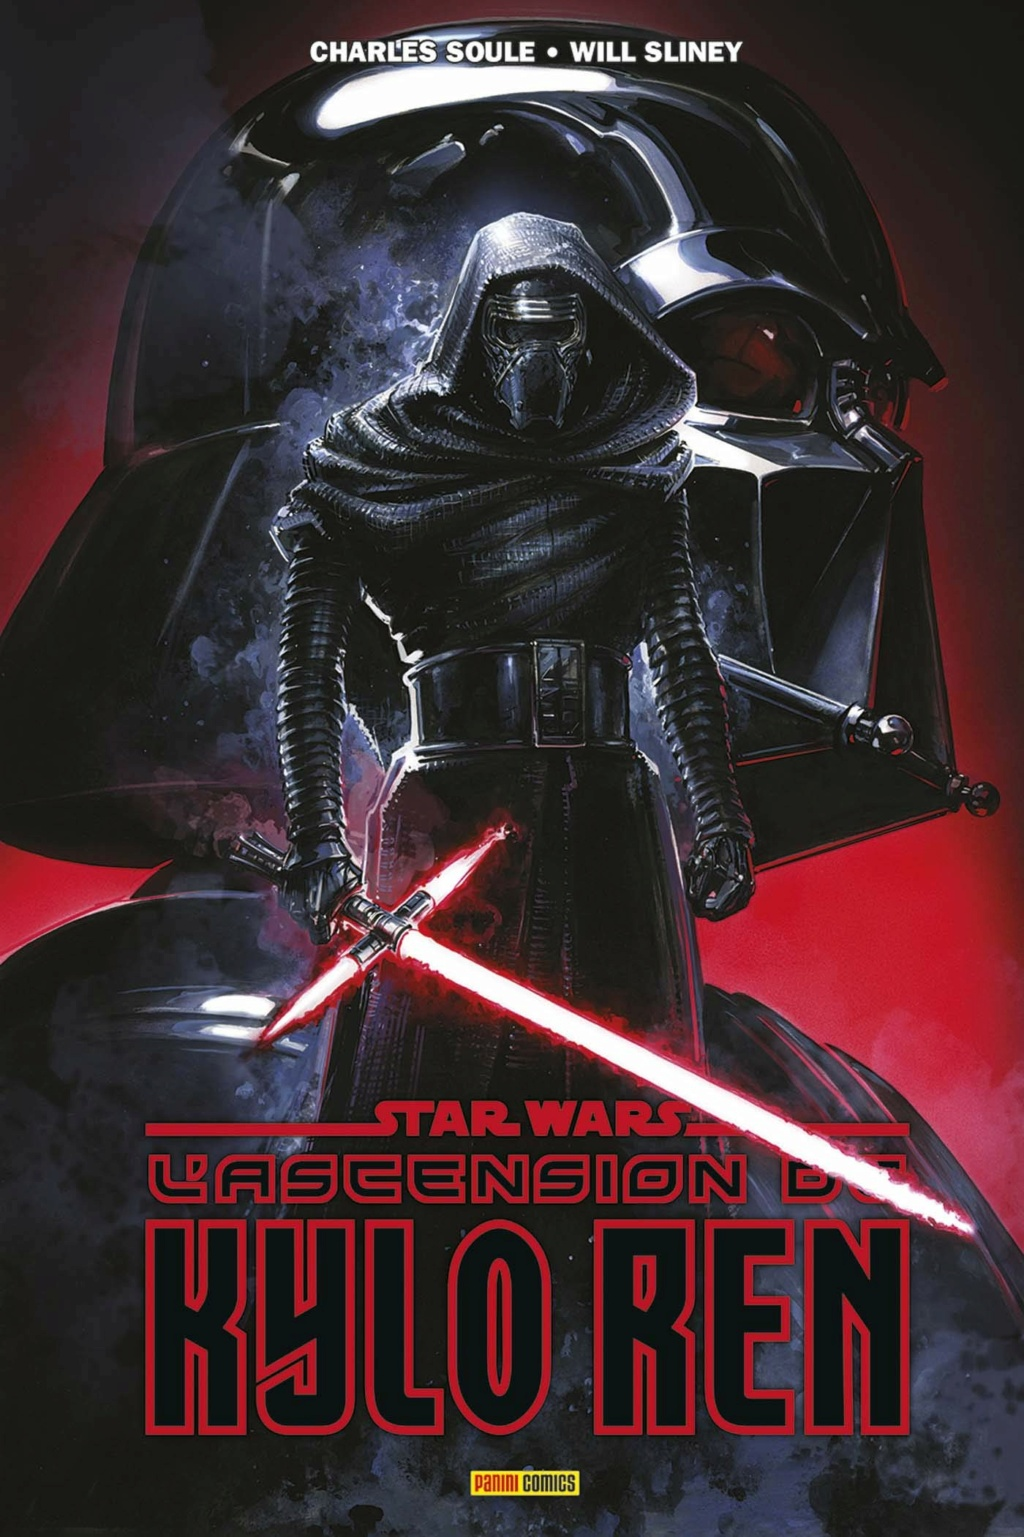 Star Wars L'Ascension de Kylo Ren - PANINI Ascens17